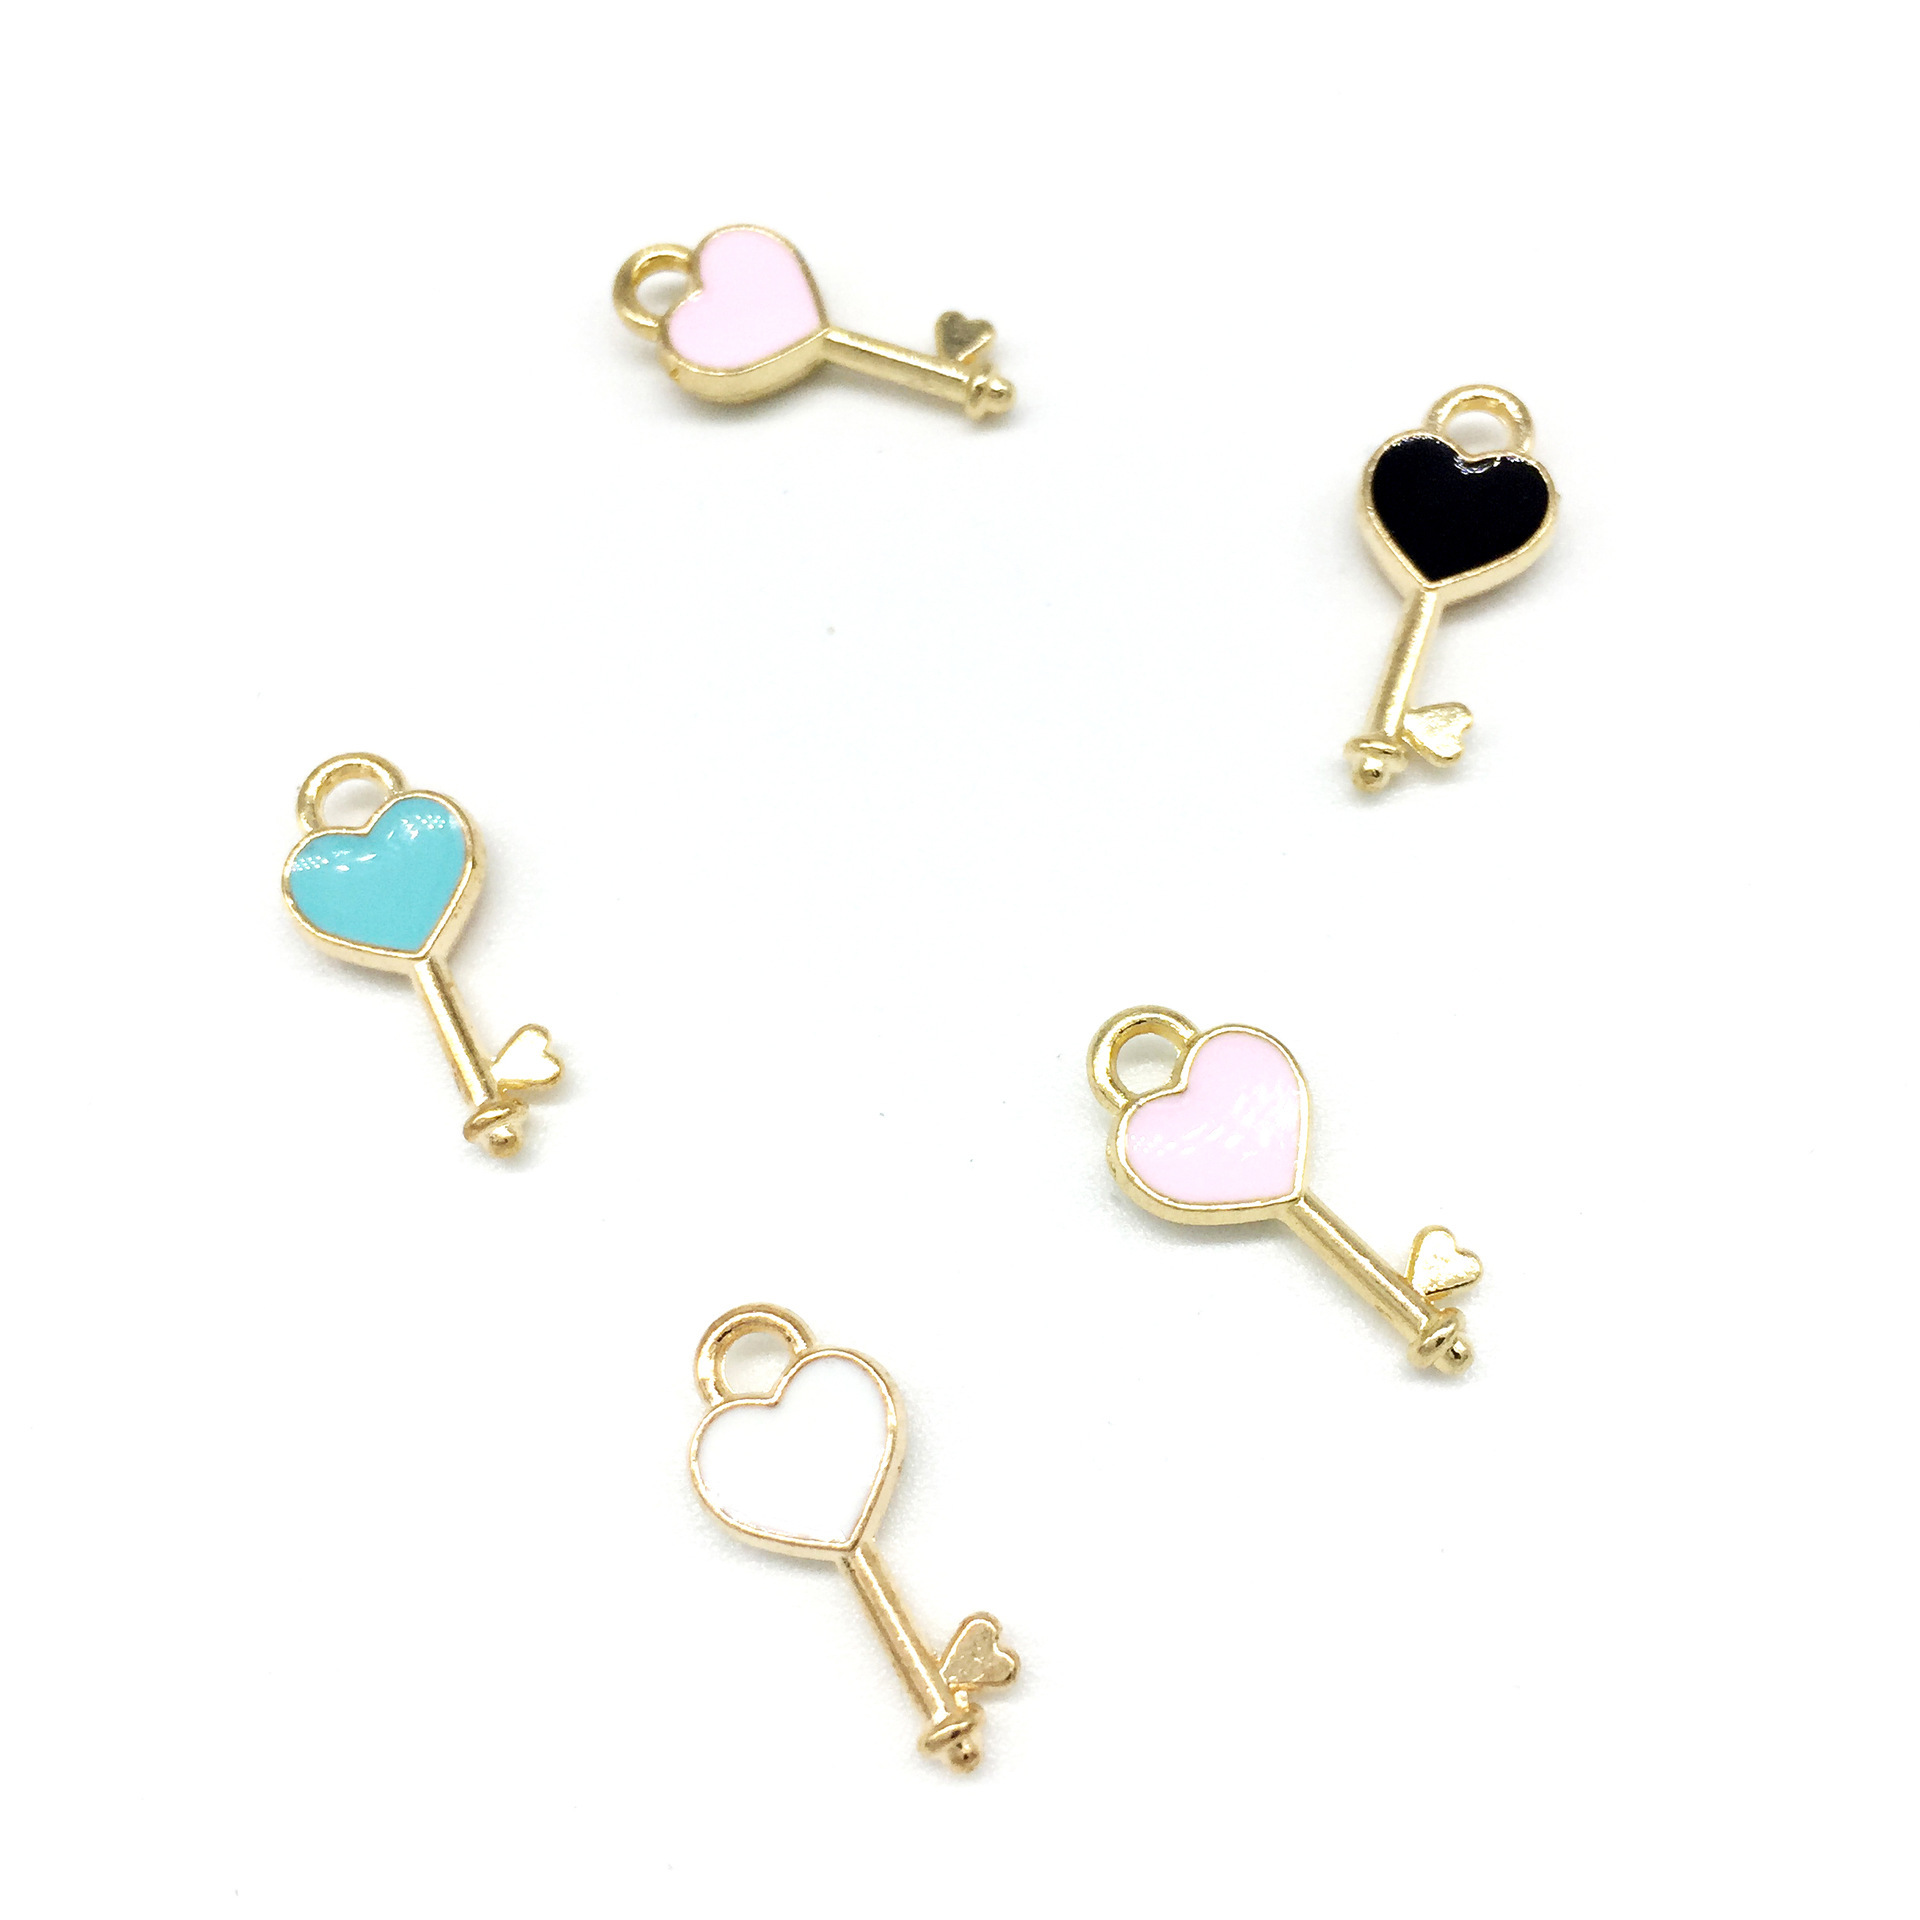 30pcs/lot New 7*16mm Heart Shape Key Enamel Pendant Carousel Charms for DIY Bracelet Necklace